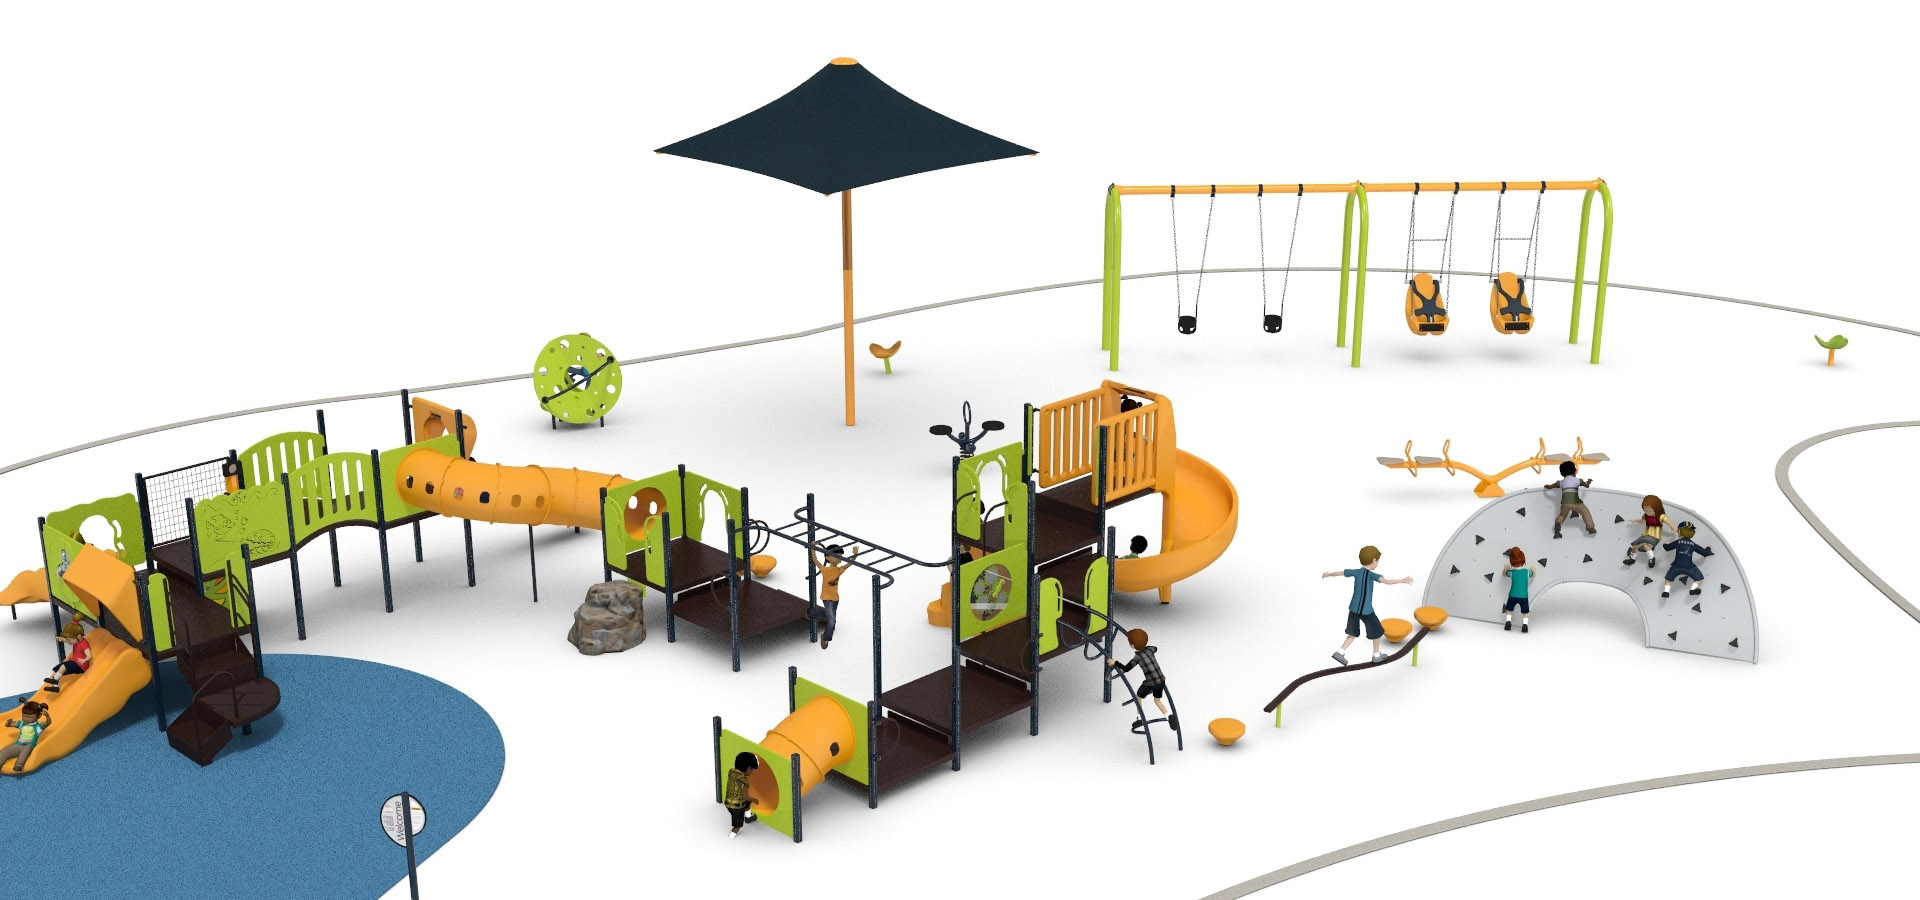 Lake St. Clair Playground Rendering